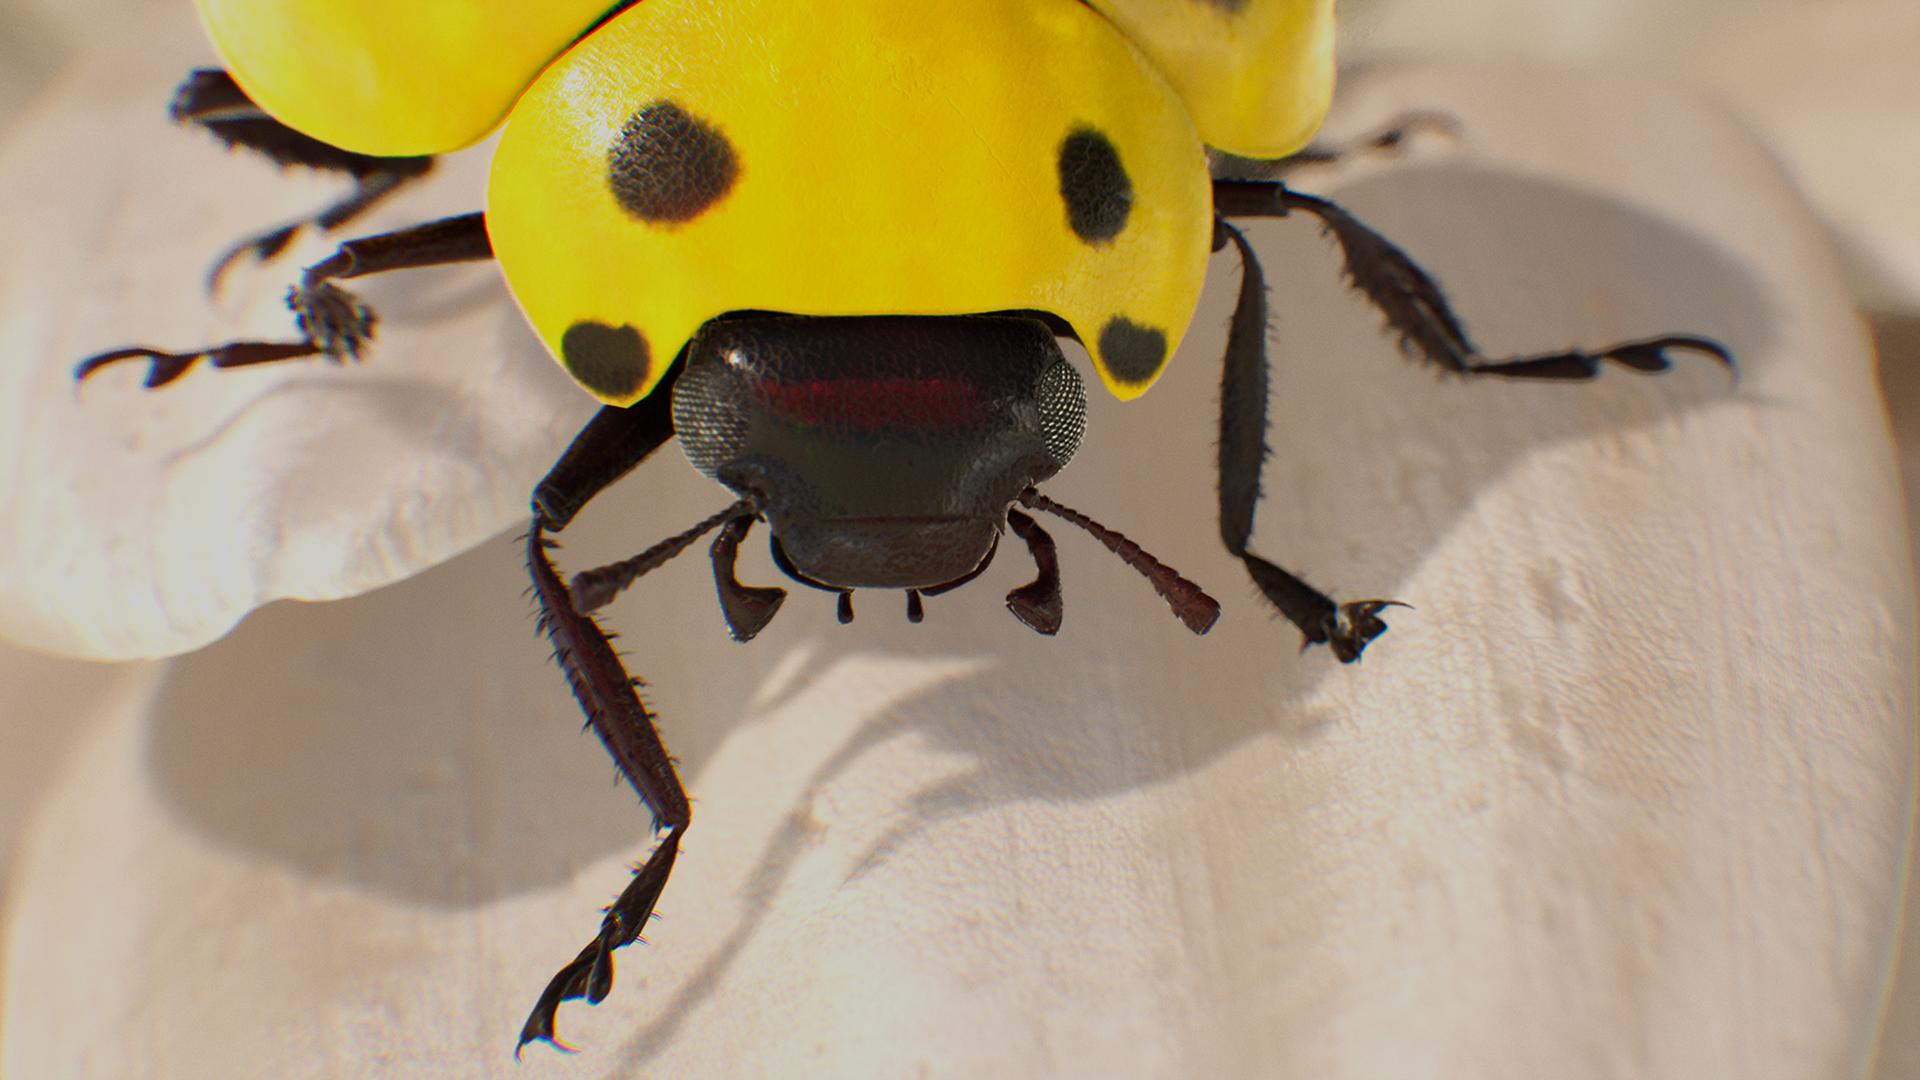 A high-quality ladybug.